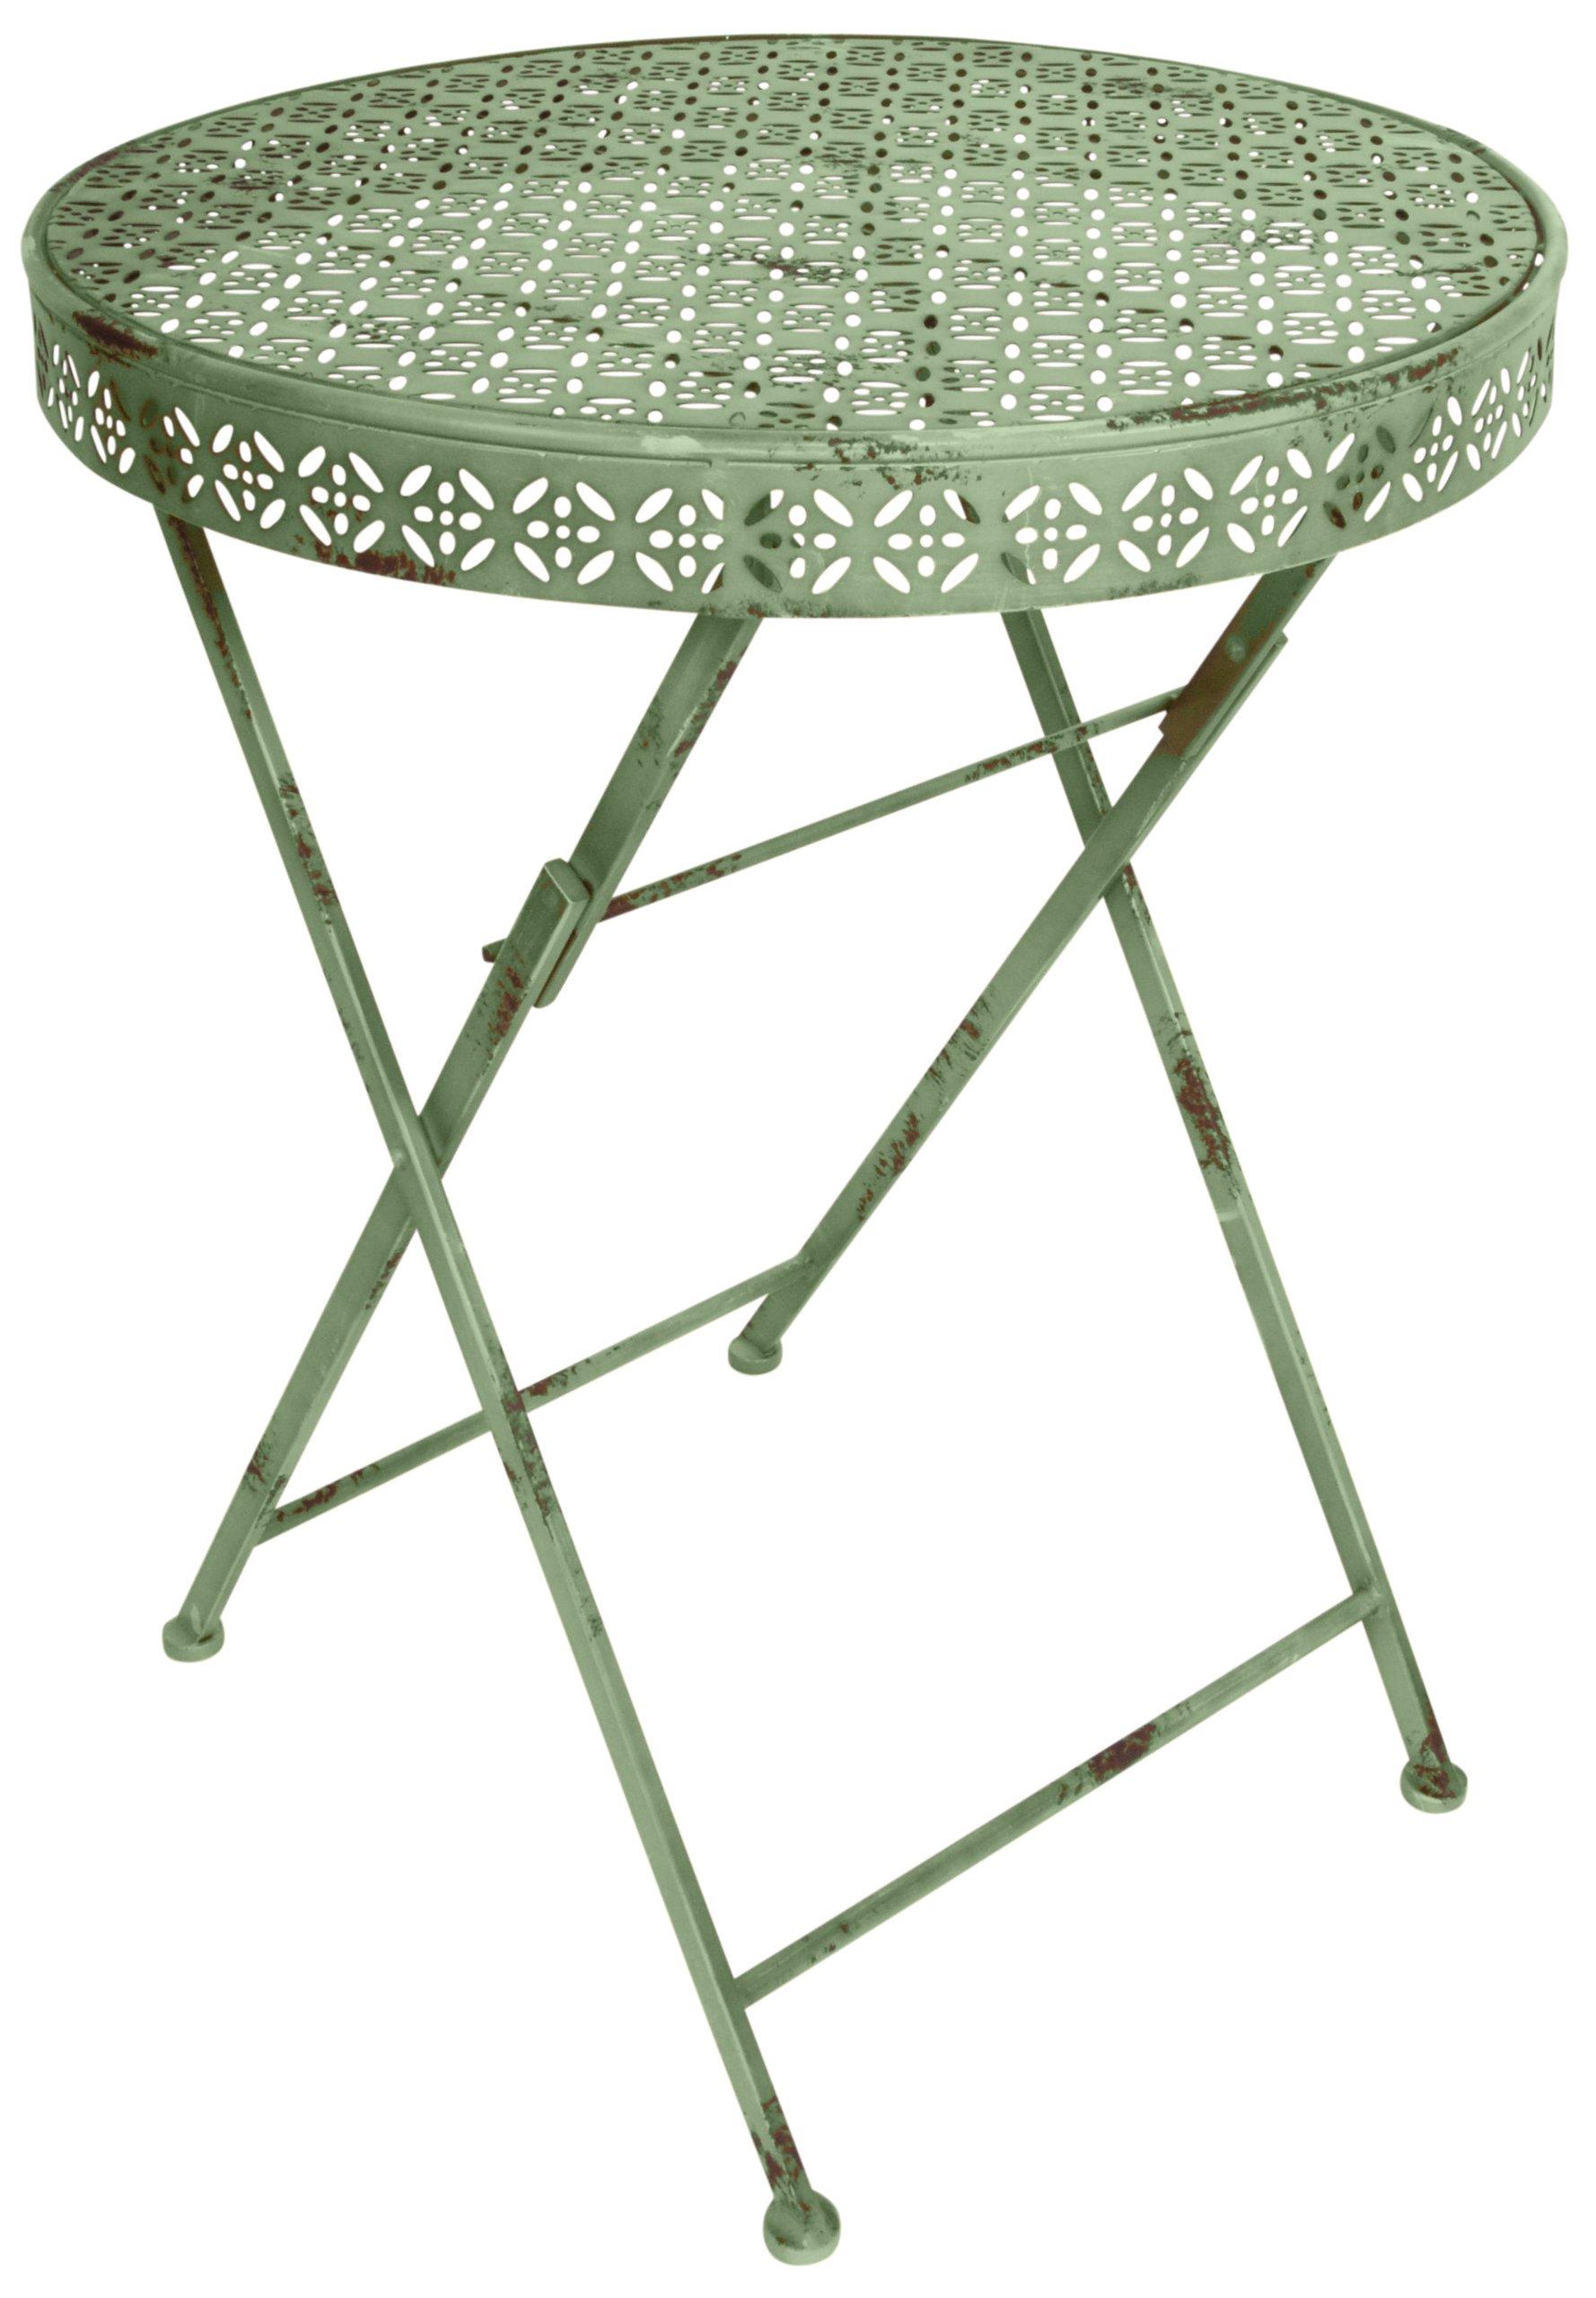 "Esschert Design Industrial Heritage Round Bistro Table - Table 23"" x 23"" x 30"" Part of the Esschert Design Industrial Heritage Line Distressed Metal - patio-tables, patio-furniture, patio - 817W1uERc6L -"